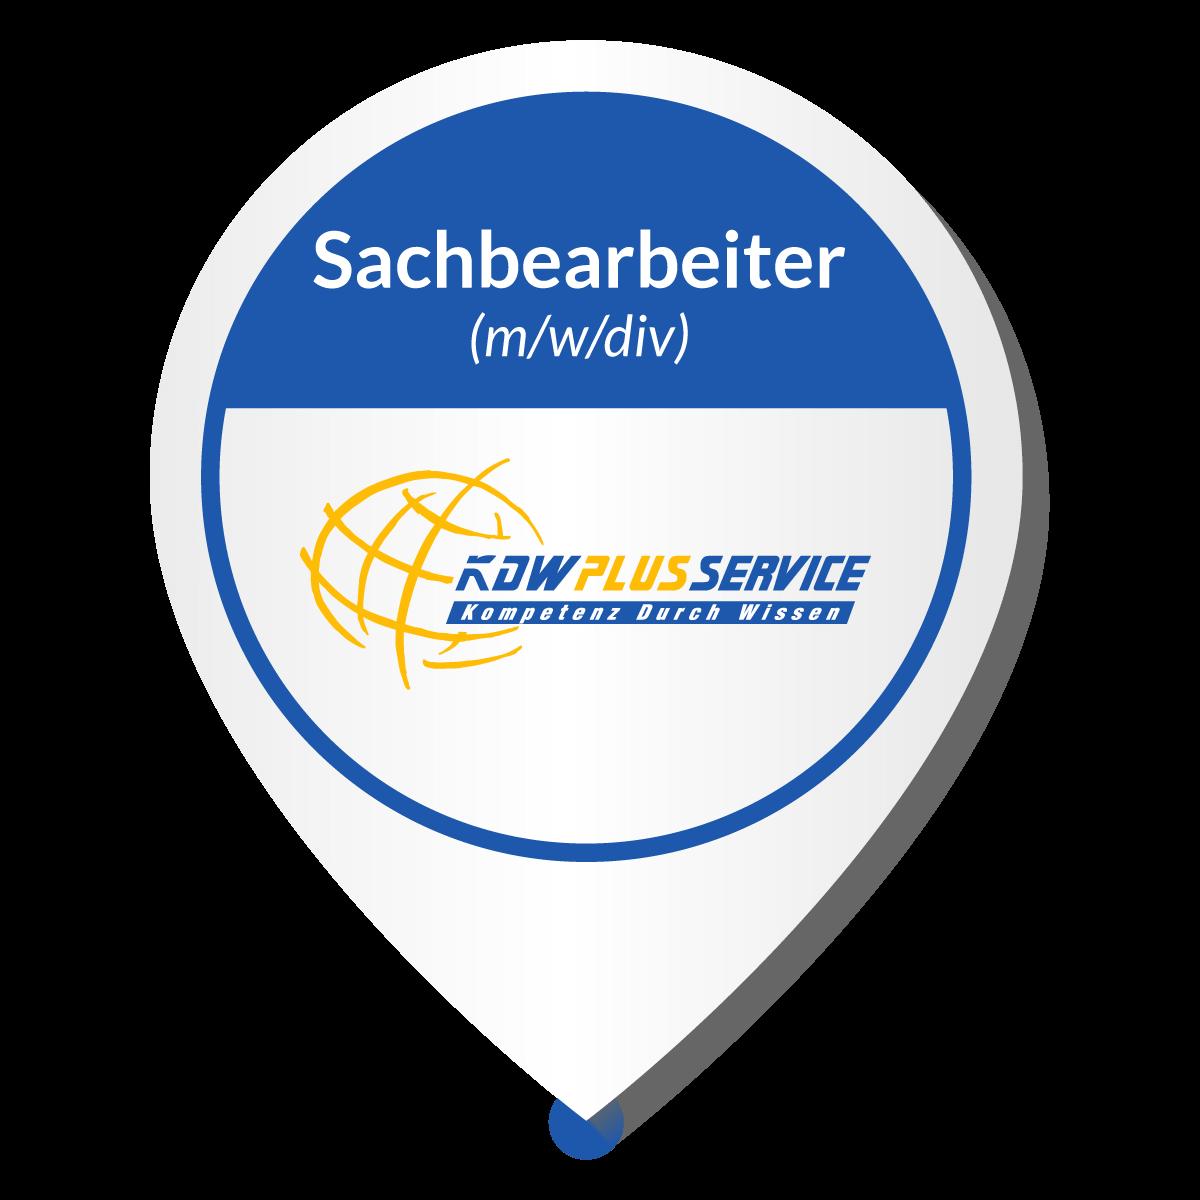 Jobangebot Sachbearbeiter (m/w/div) KDW Plus Service GmbH Sachbearbeiter